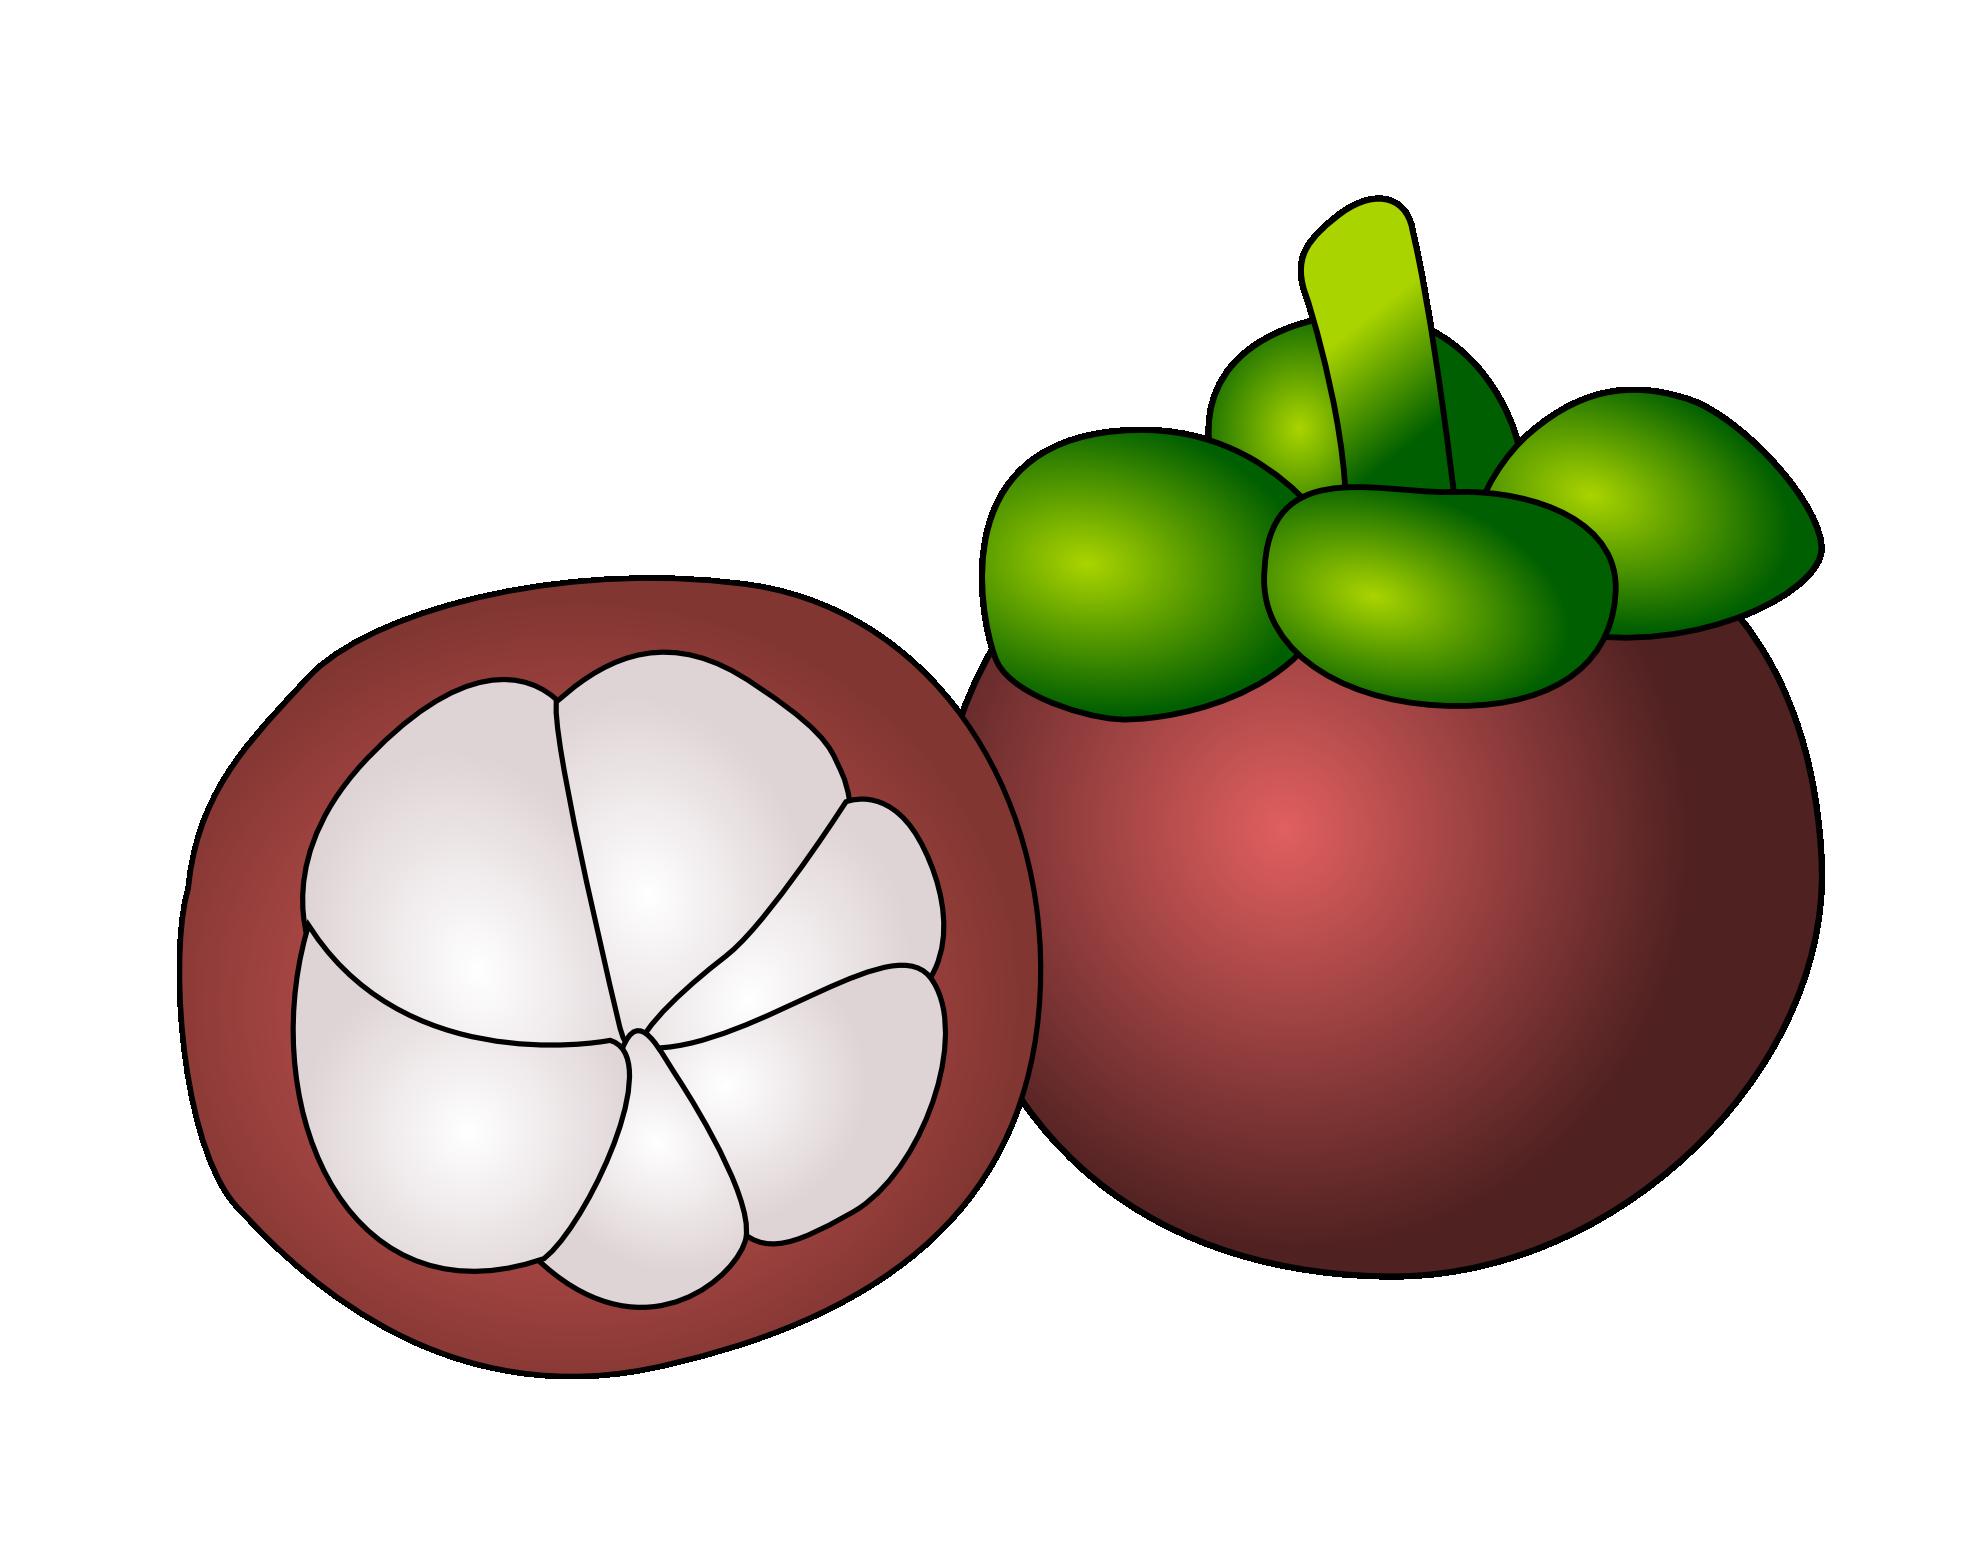 Tomatoes clipart gambar.  fruits clip art